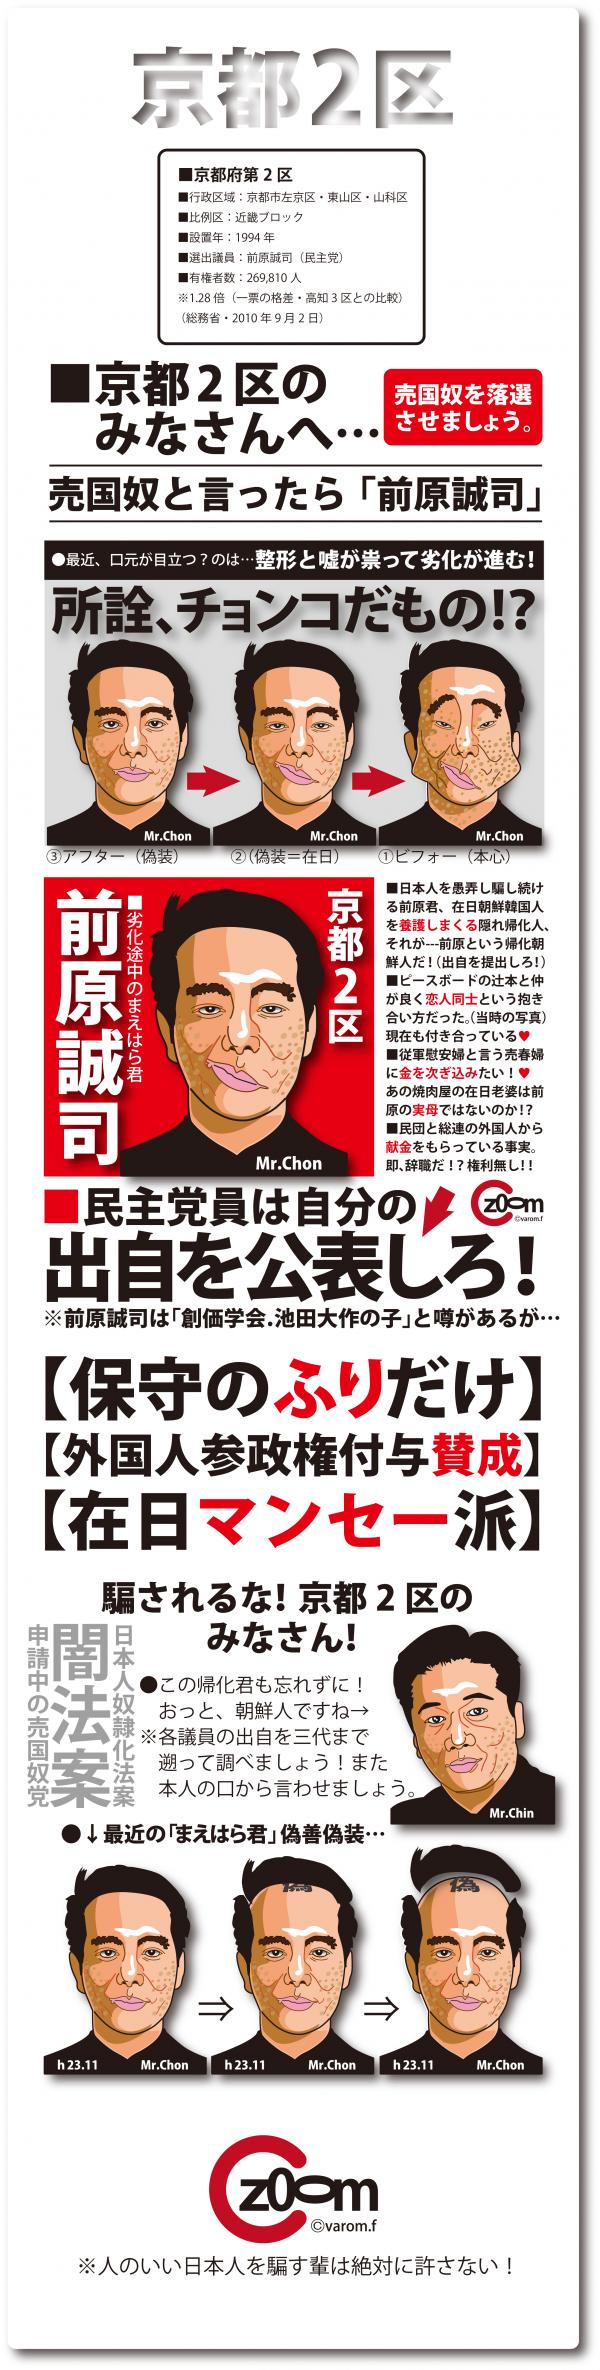 kyouto2ku+maehara_convert_20111201153001.jpg